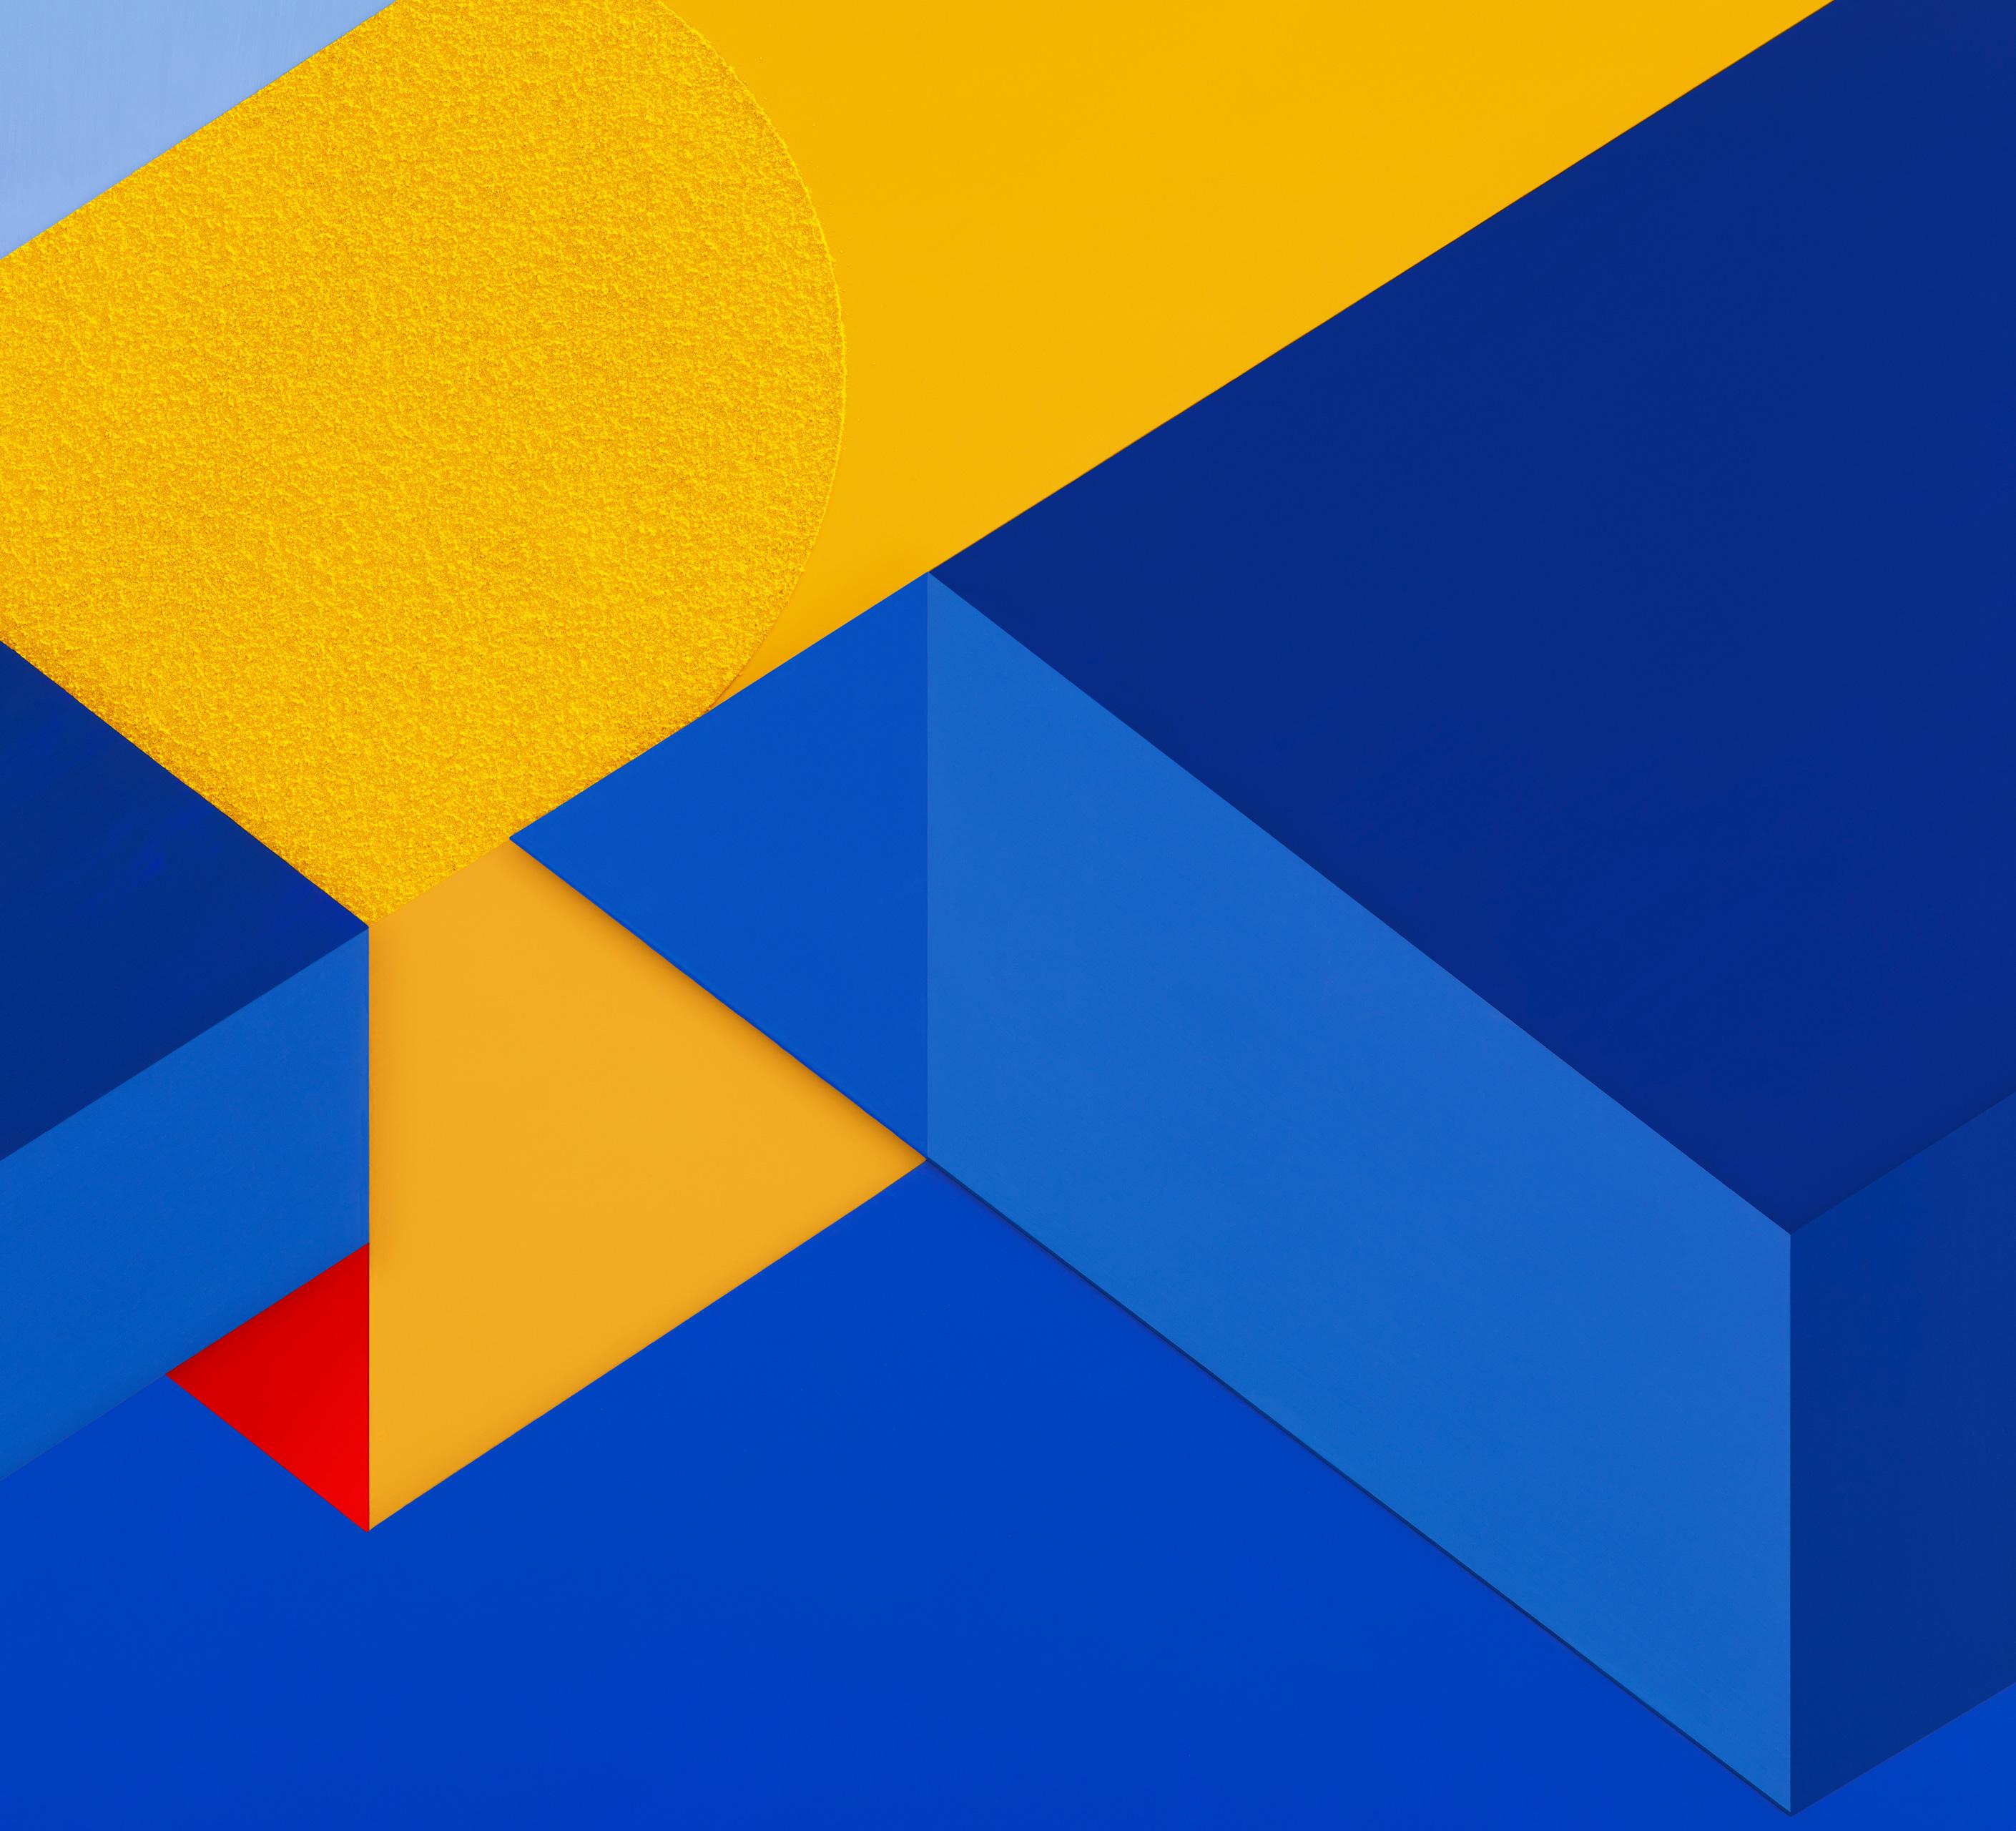 38 Nexus 6 Official Wallpaper On Wallpapersafari